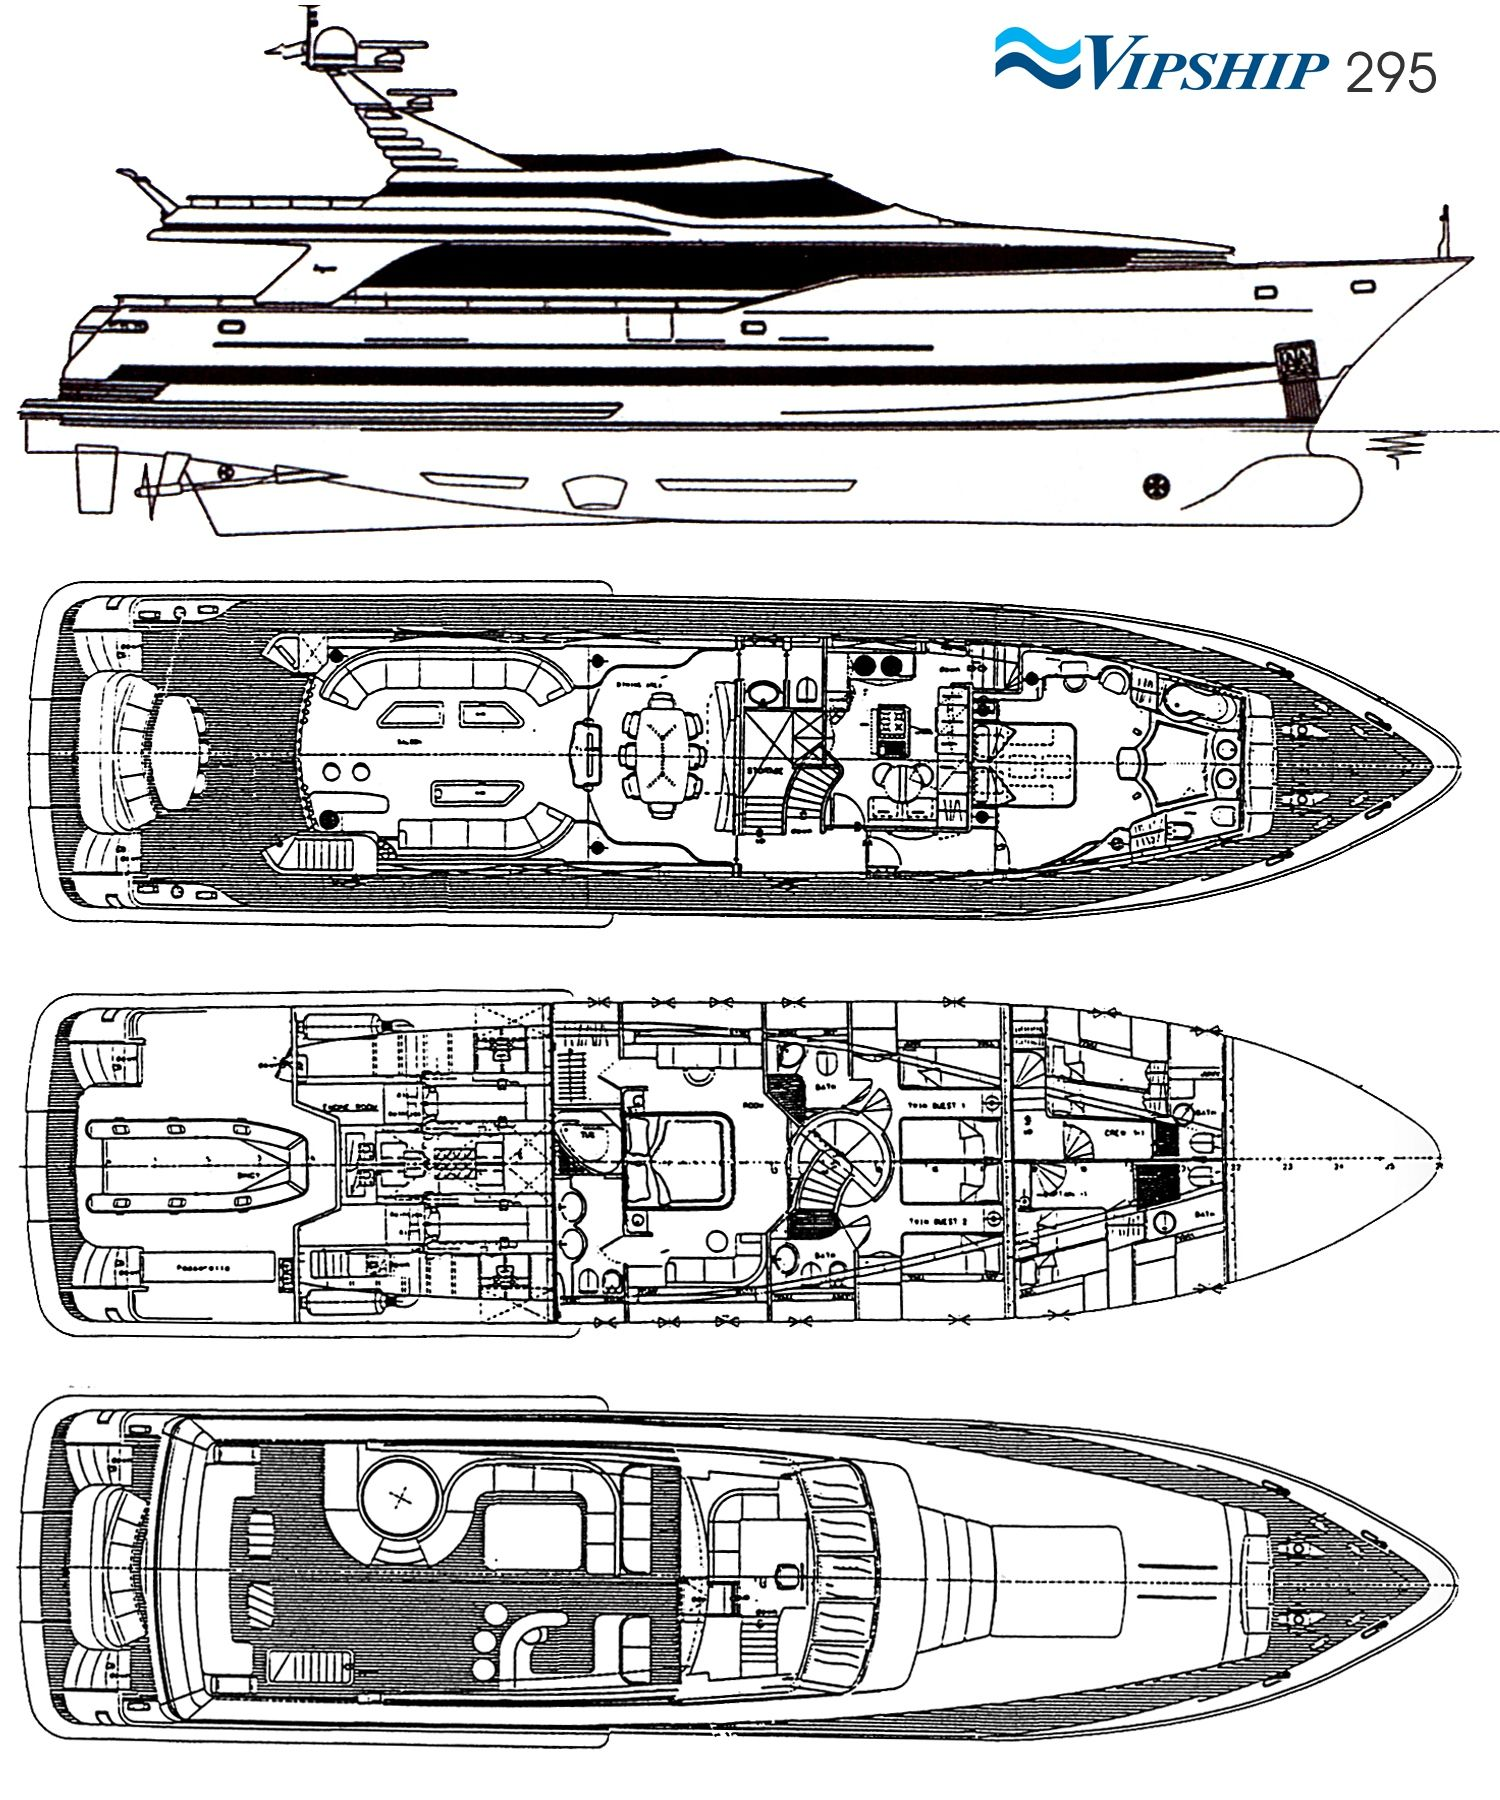 LADY P - Crewed Motor Yacht - Layout